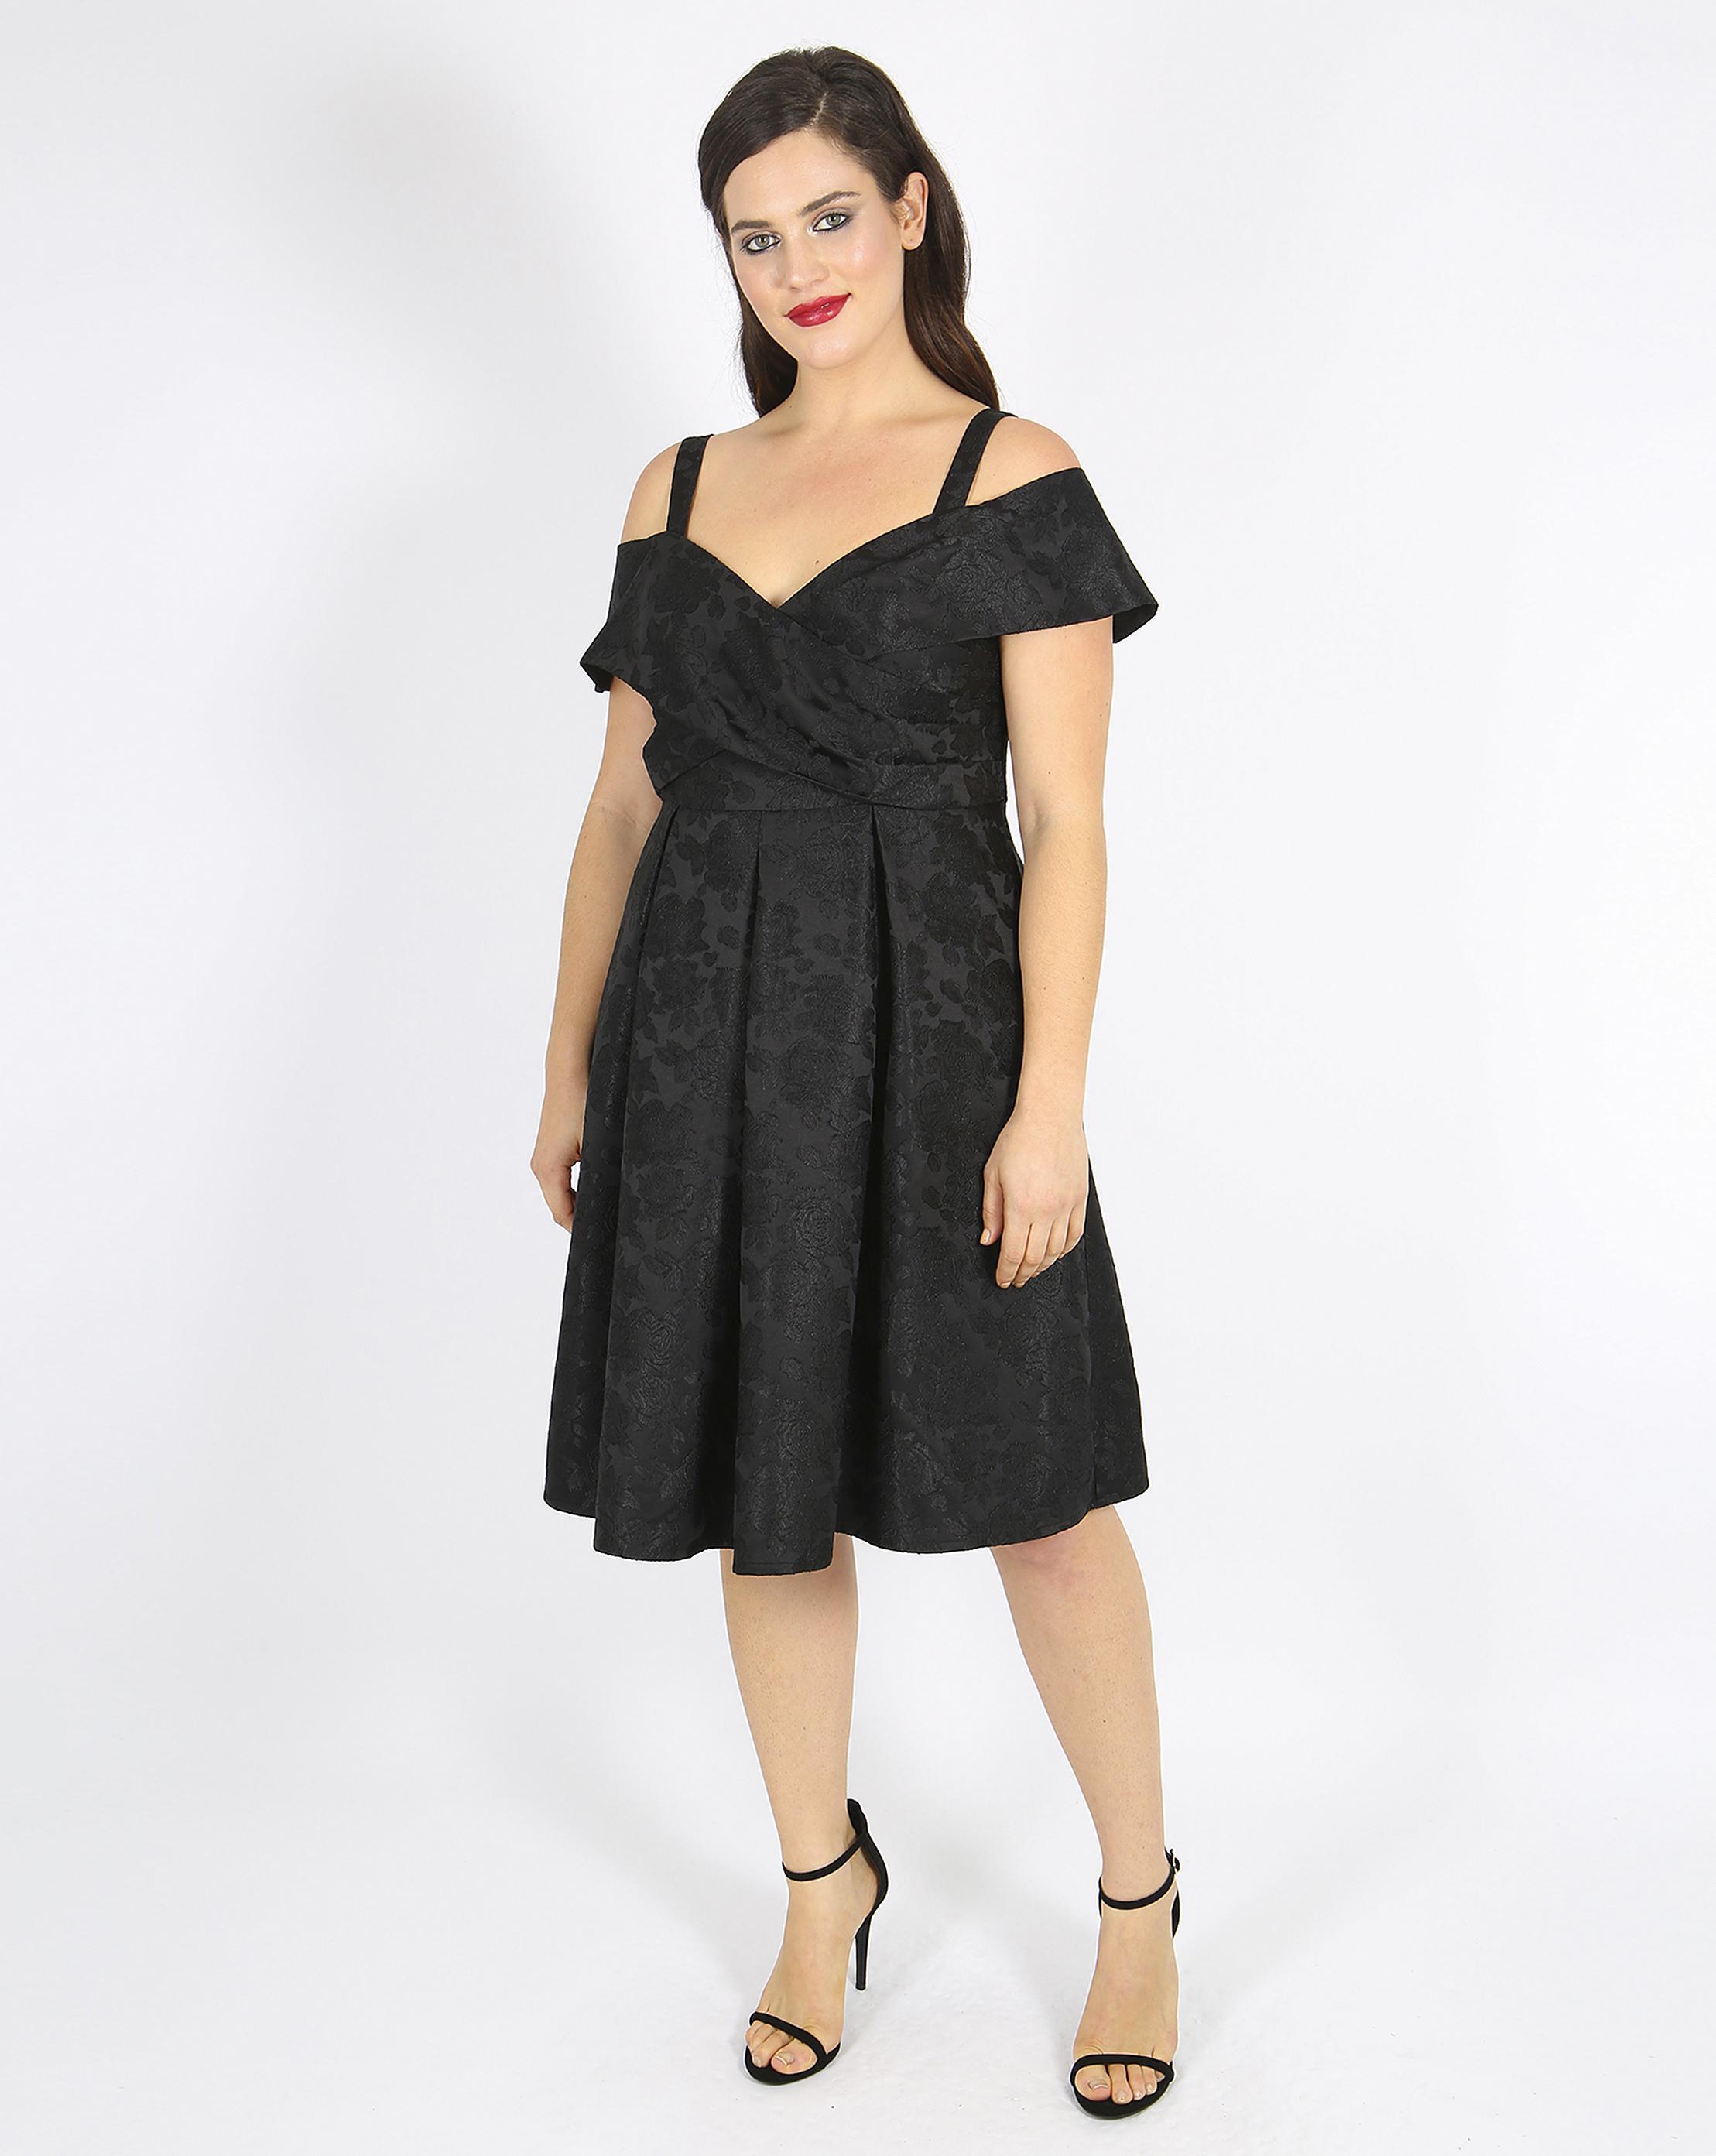 Lyst - Simply Be Lovedrobe Bardot Jacquard Prom Dress in Black